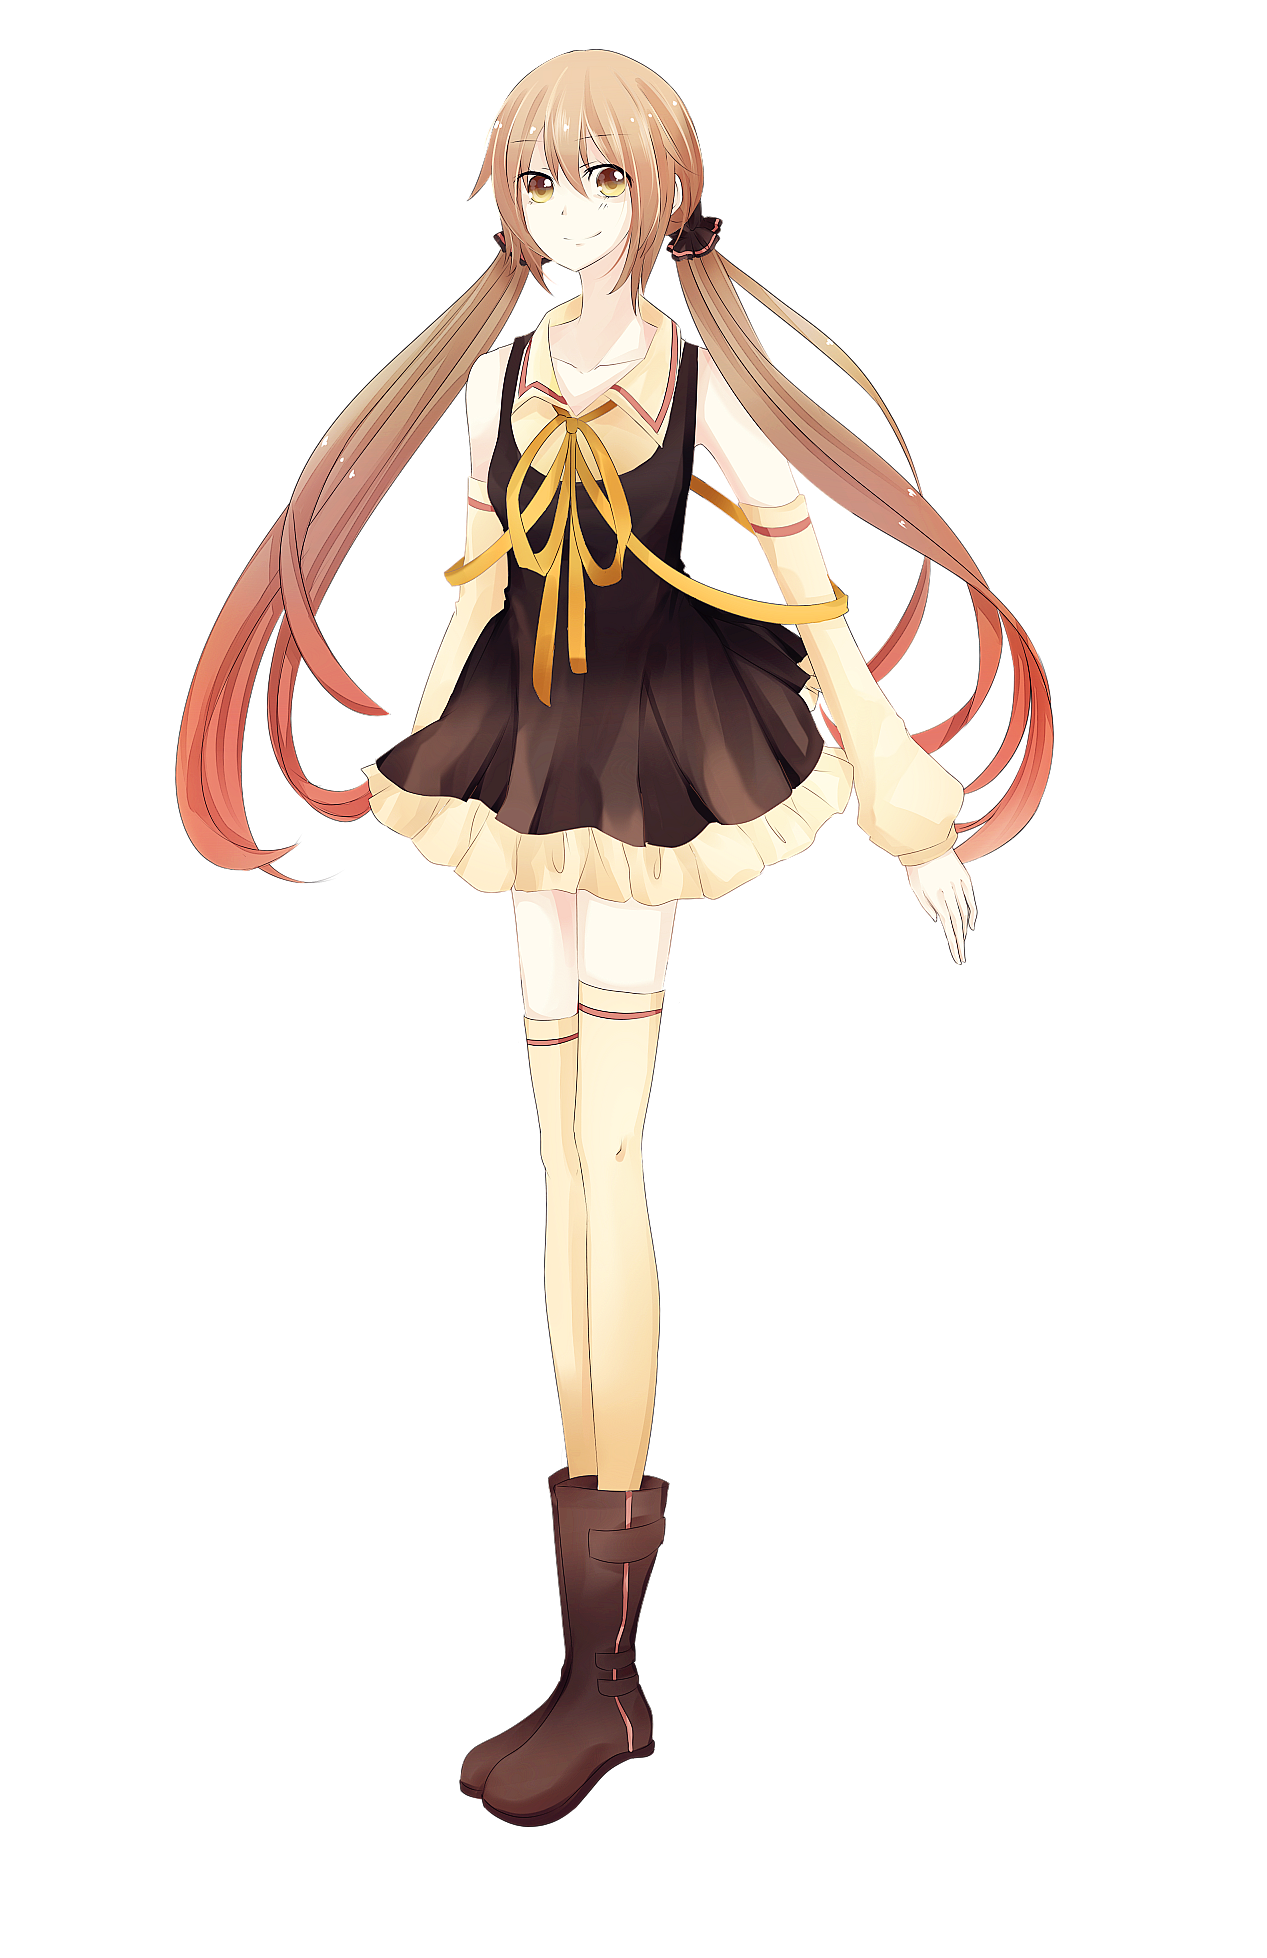 Mikado MOCHAne - UTAU Wiki 2 0